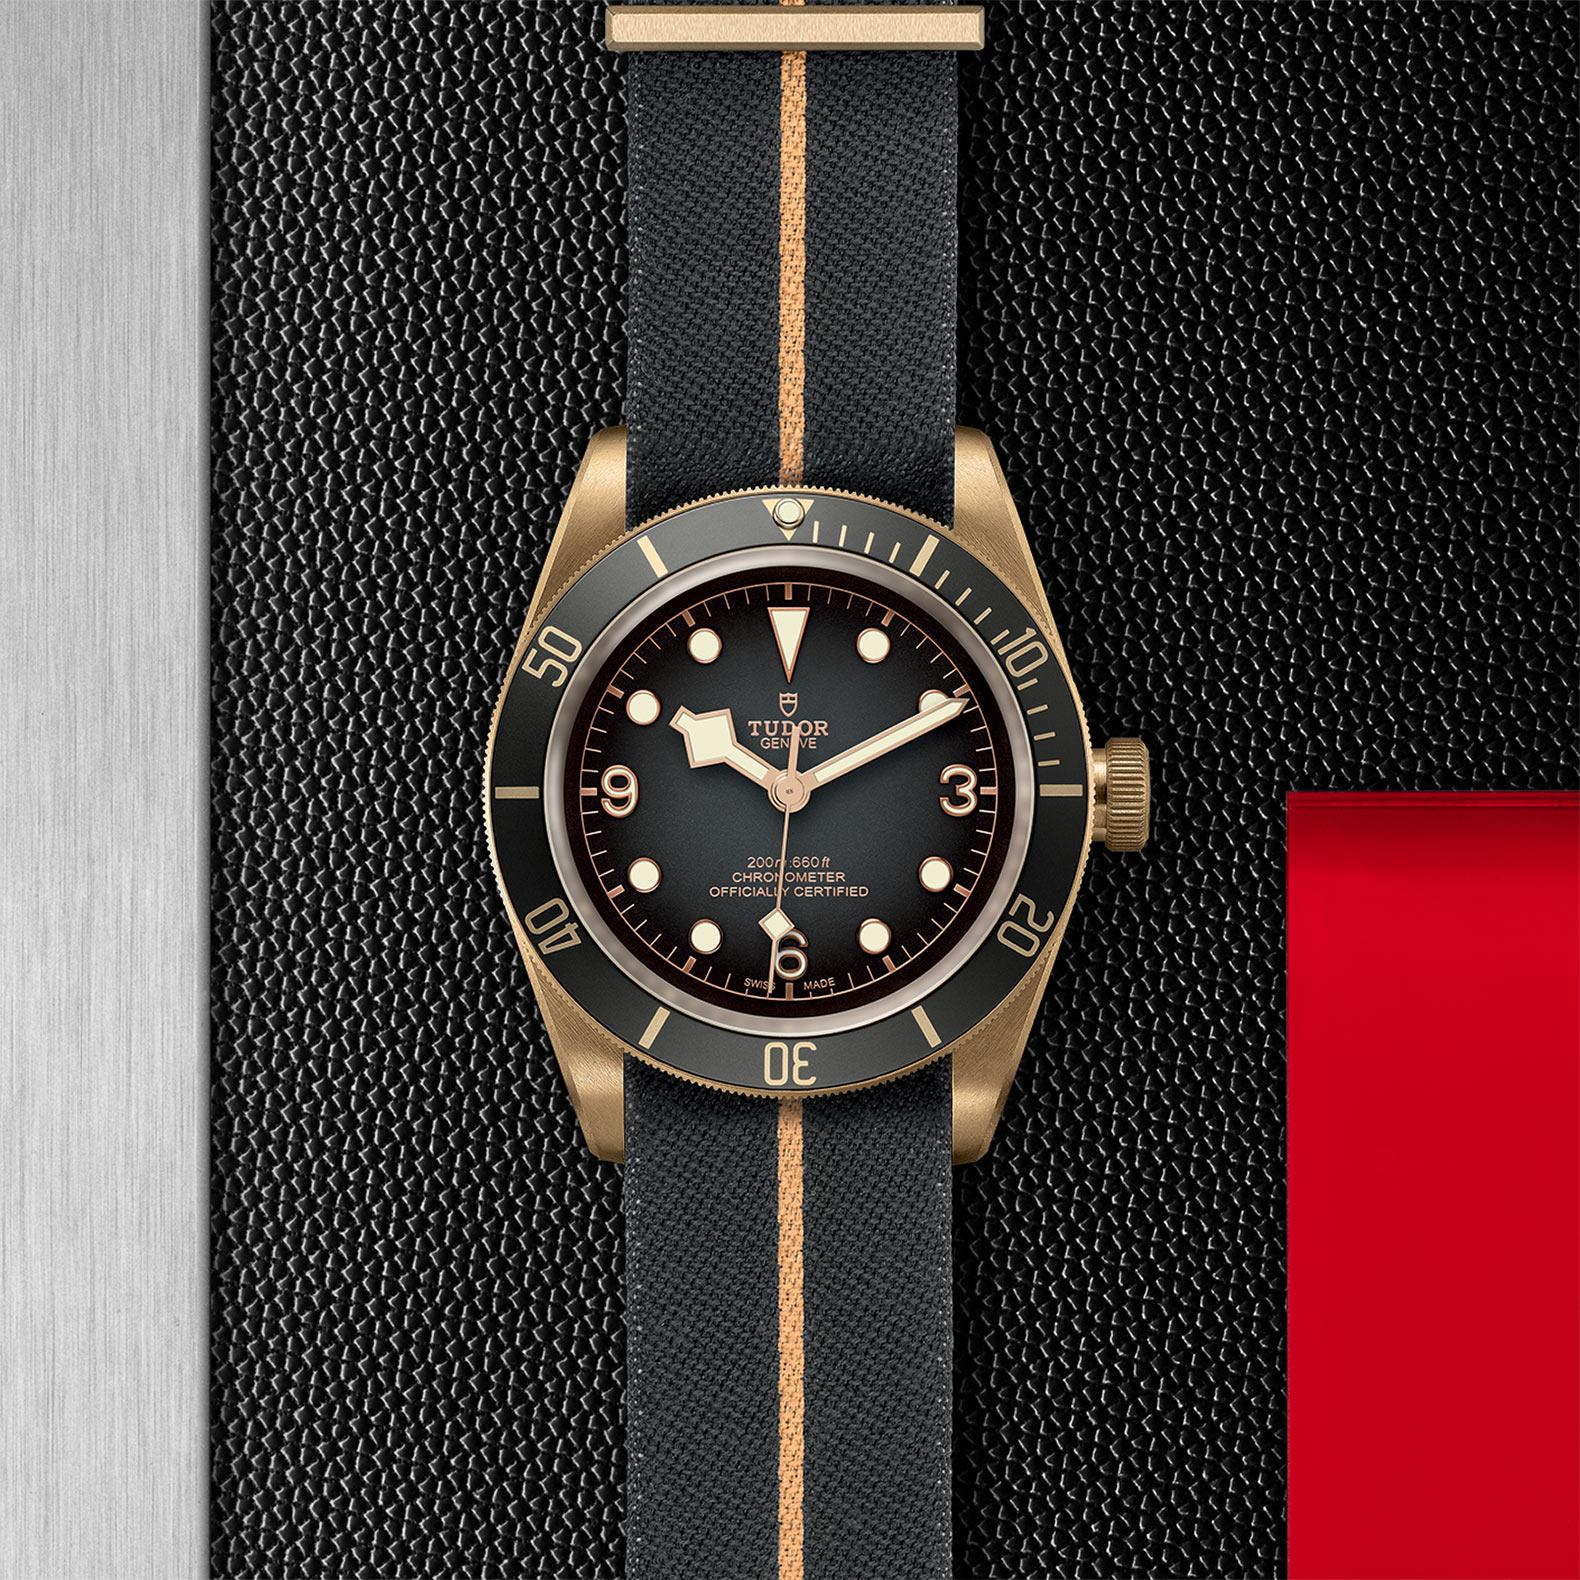 TUDOR Black Bay Bronze - M79250BA-0002